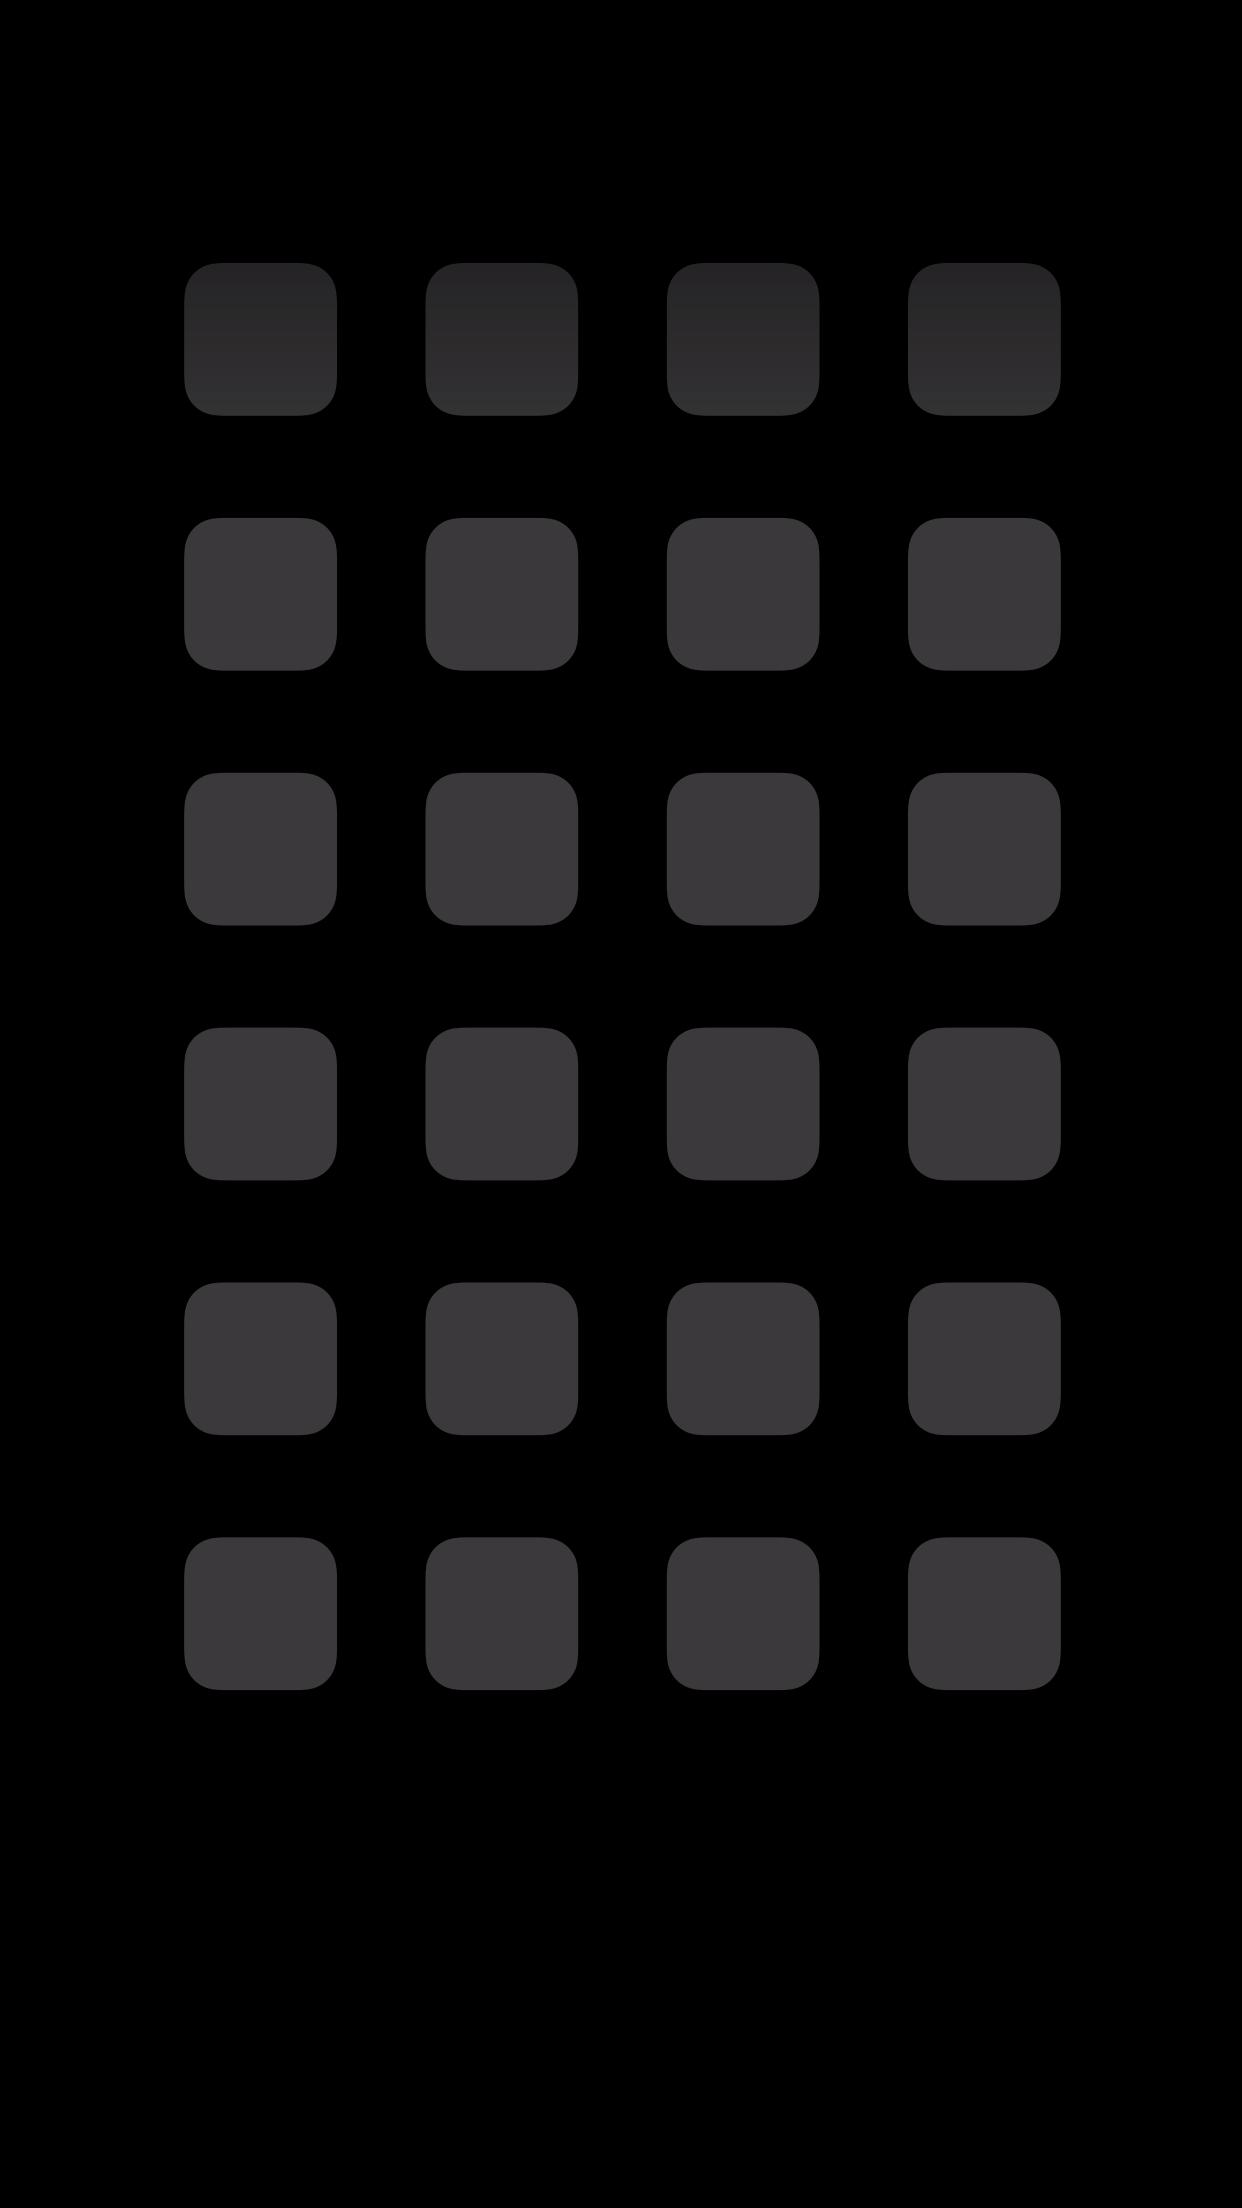 Iphone6 Plus棚の壁紙 ブラック ブラック Black Black Wallpaper To